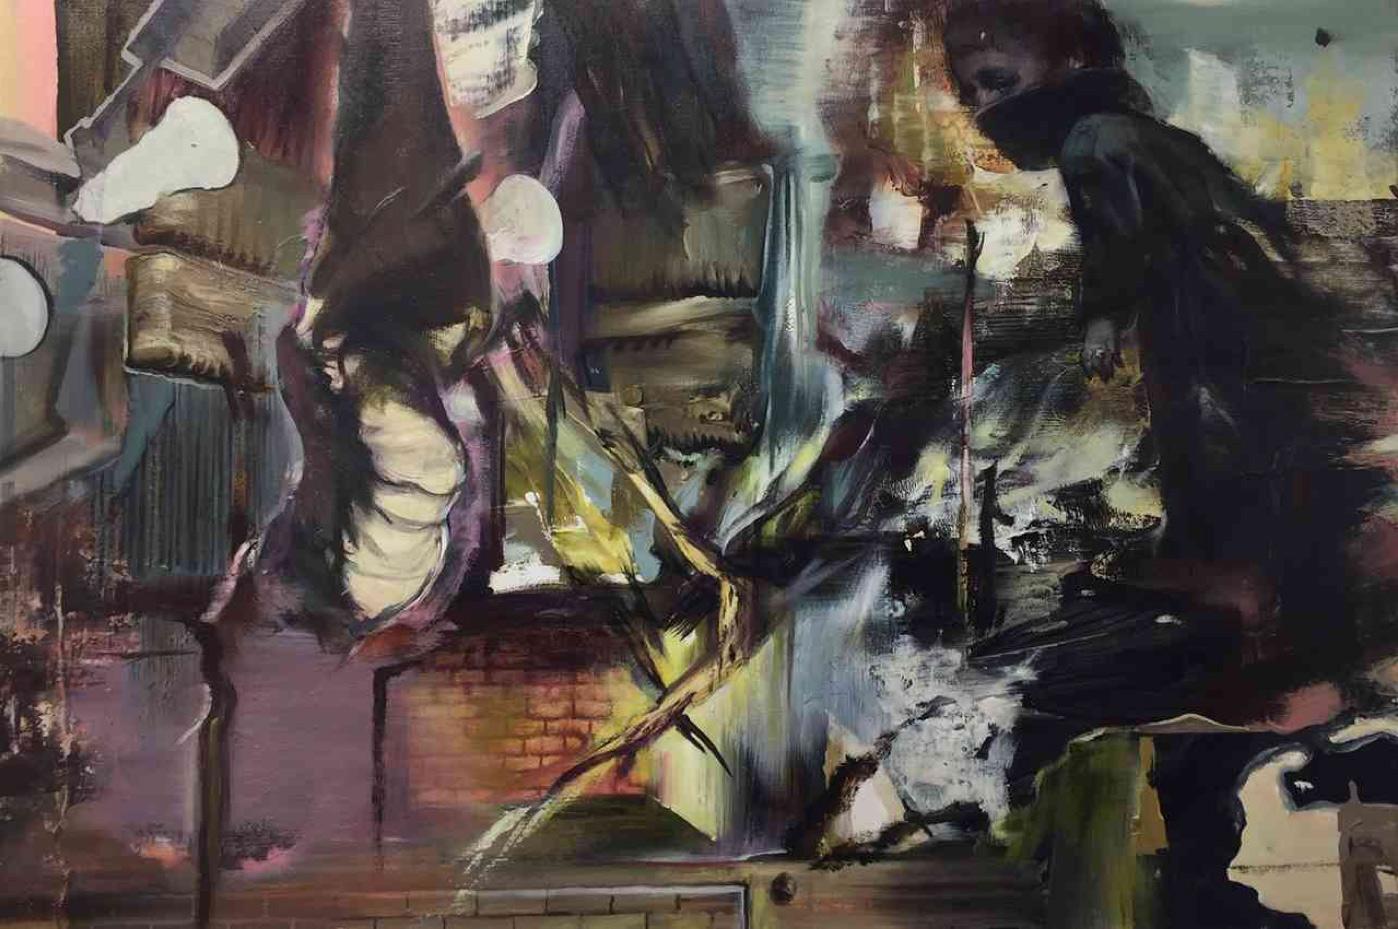 Tassos Missouras, Present Perfect, Oil and acrylics on canvas, 41x61 cm, 2019